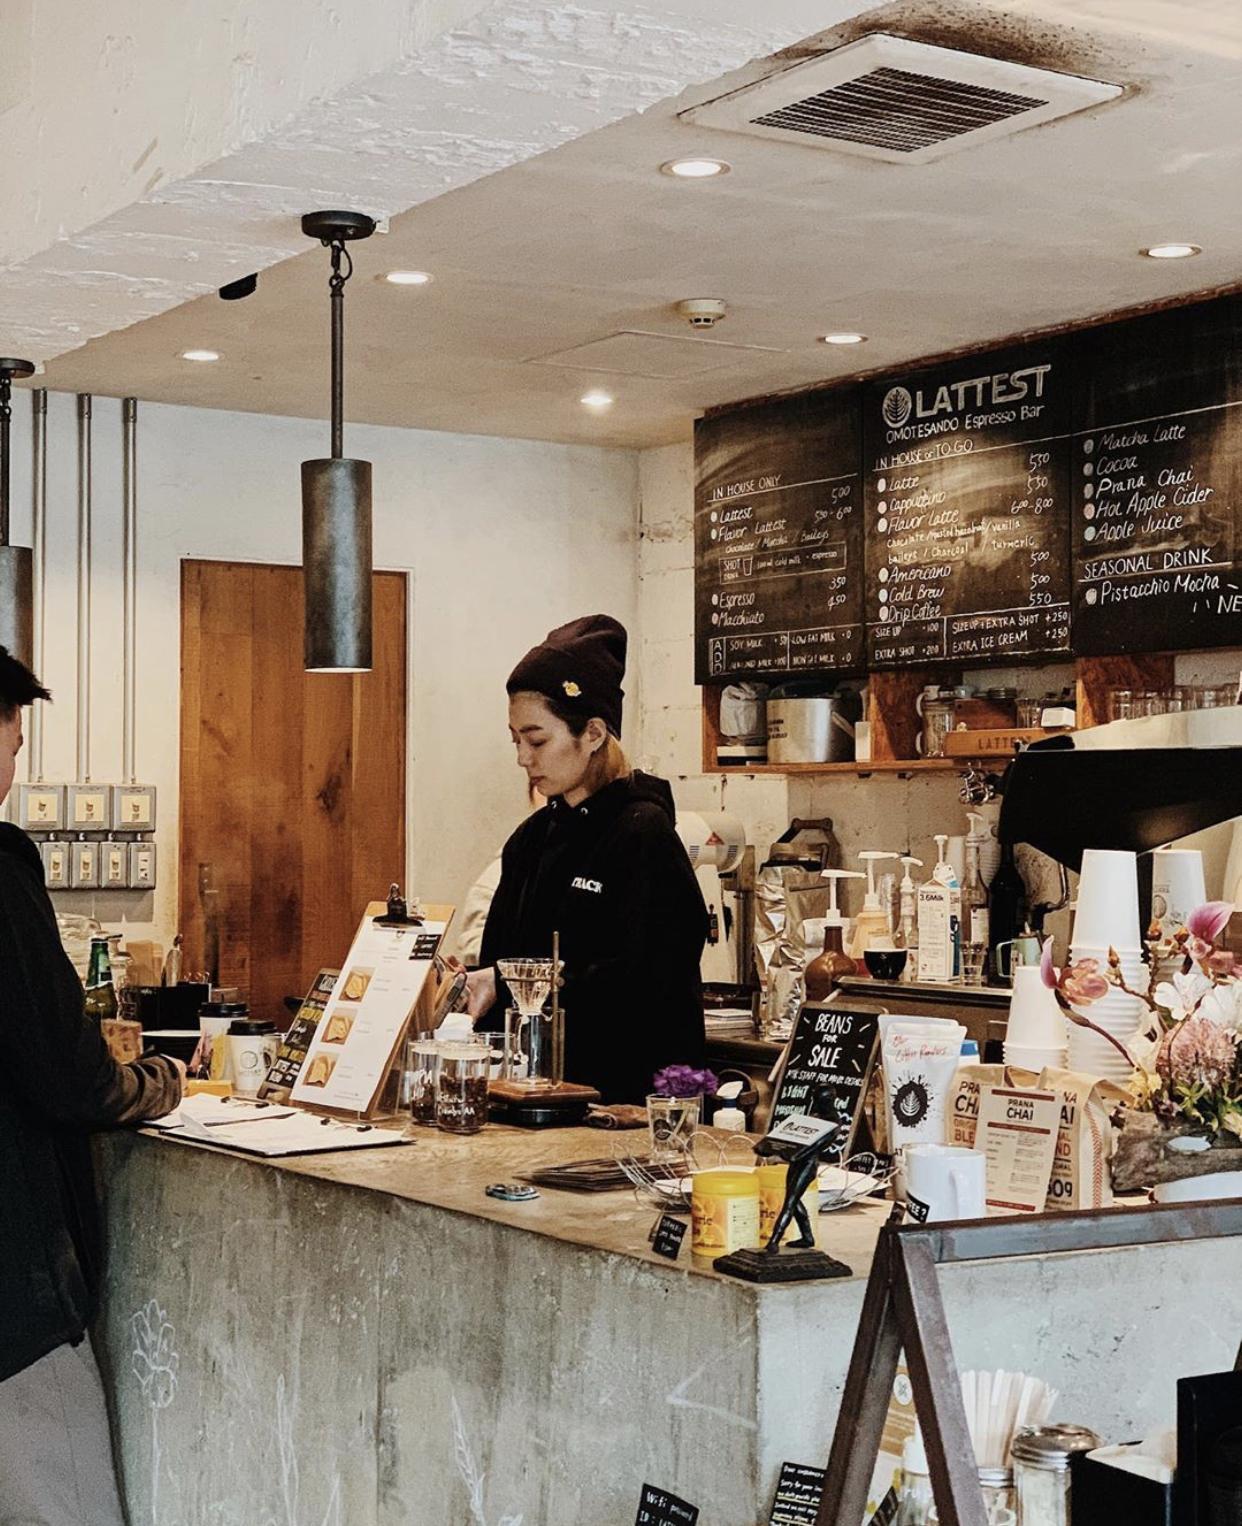 best coffee shop tokyo - Lattest Omotesando Espresso Bar